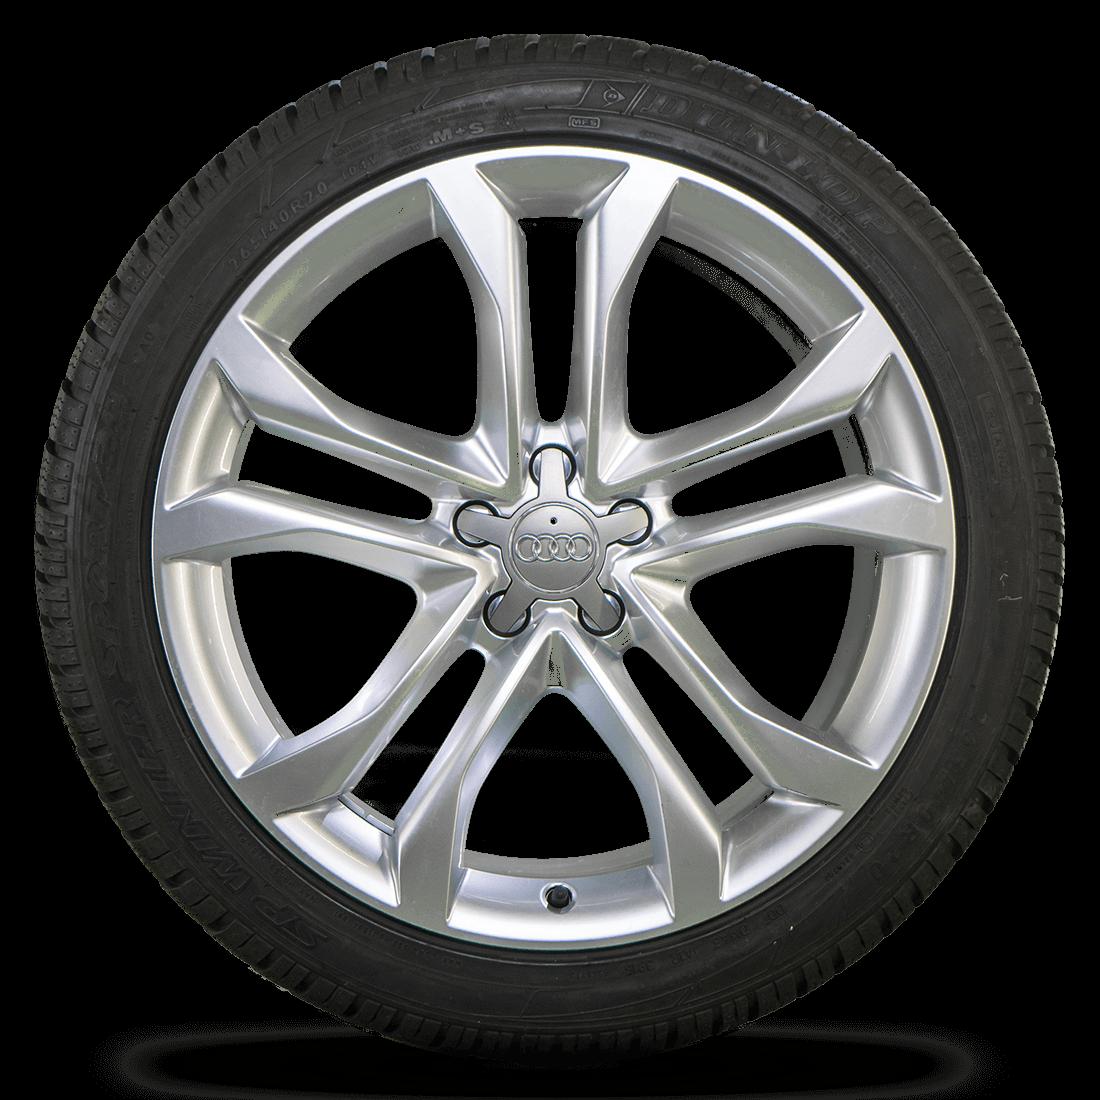 Audi 20 Inch Rims A8 S8 4H 4N Aluminum Rims Winter Tires